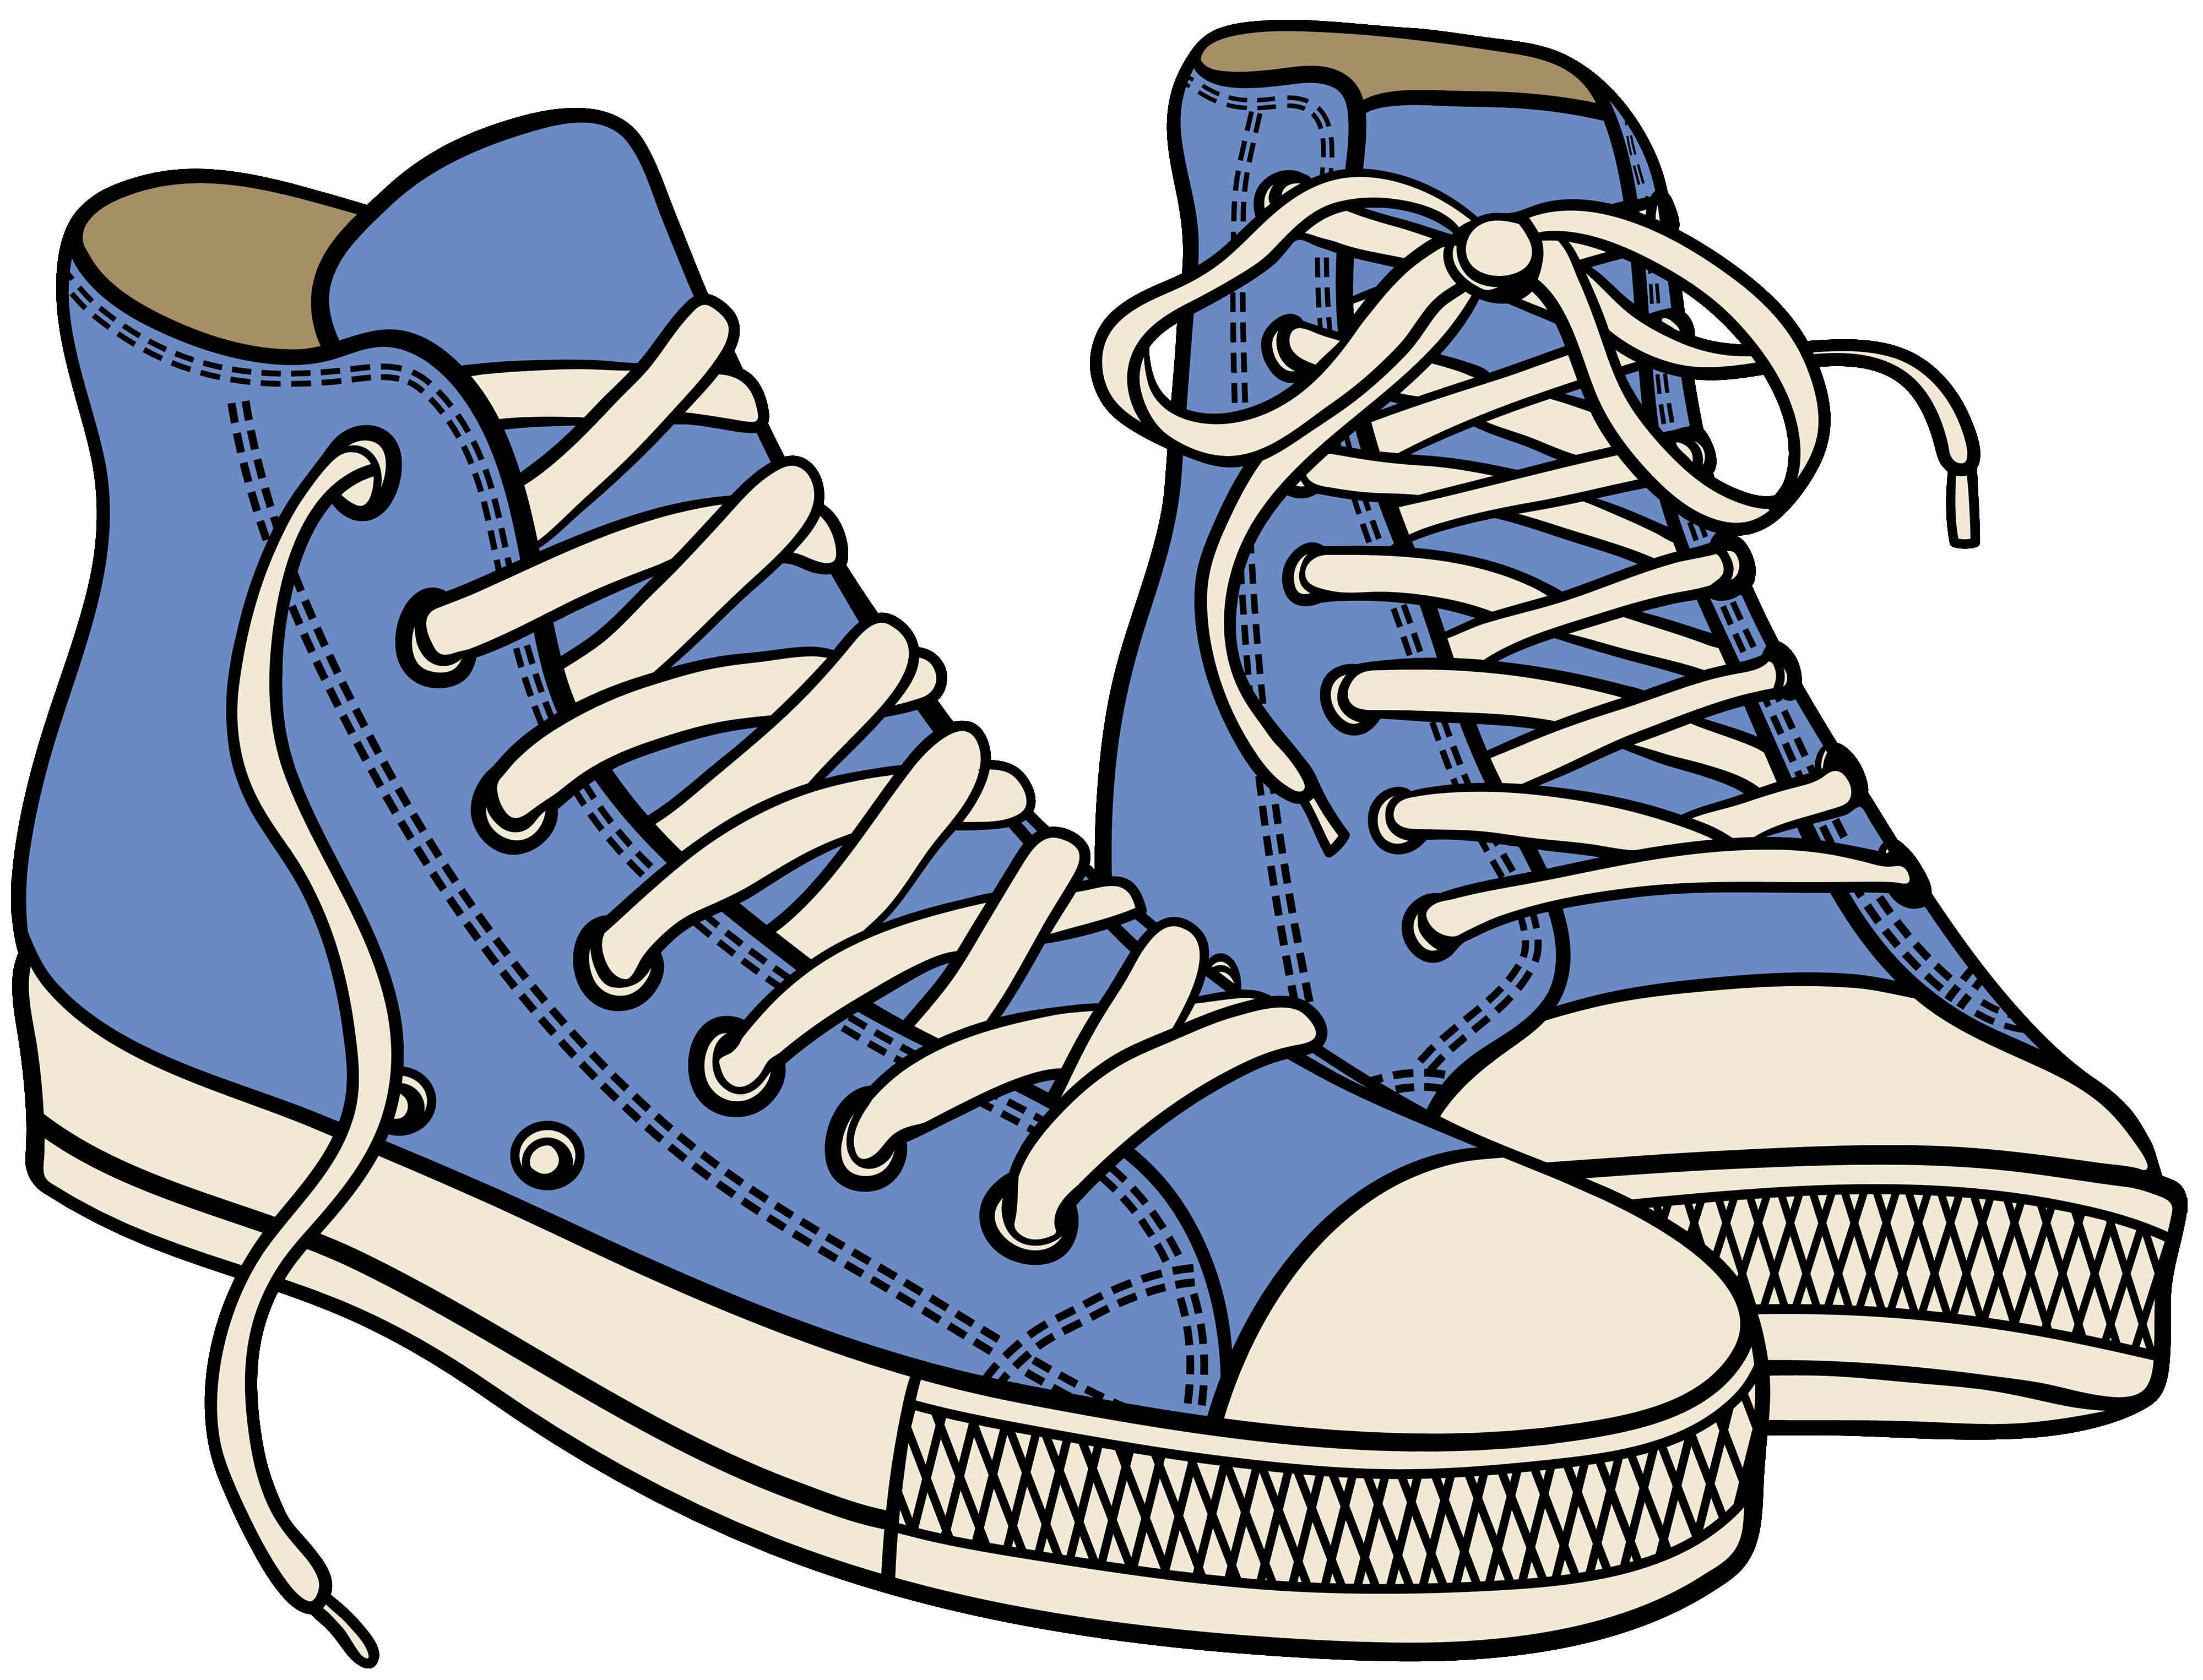 Running Shoes Cartoon Clipart | Free download best Running